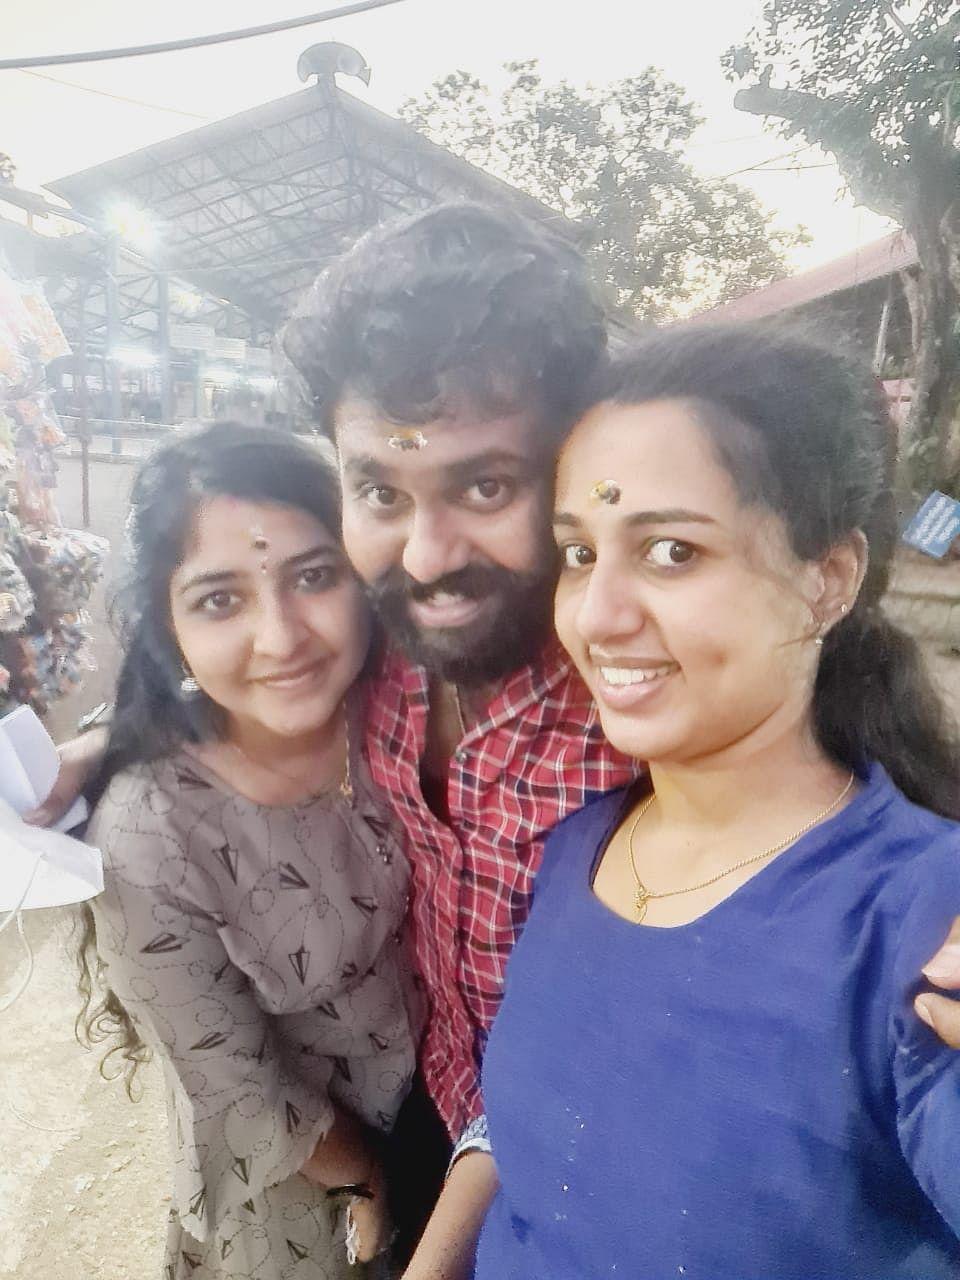 Vismaya V Nair (right) with her brother Vijith V Nair and sister-in-law Revathi.